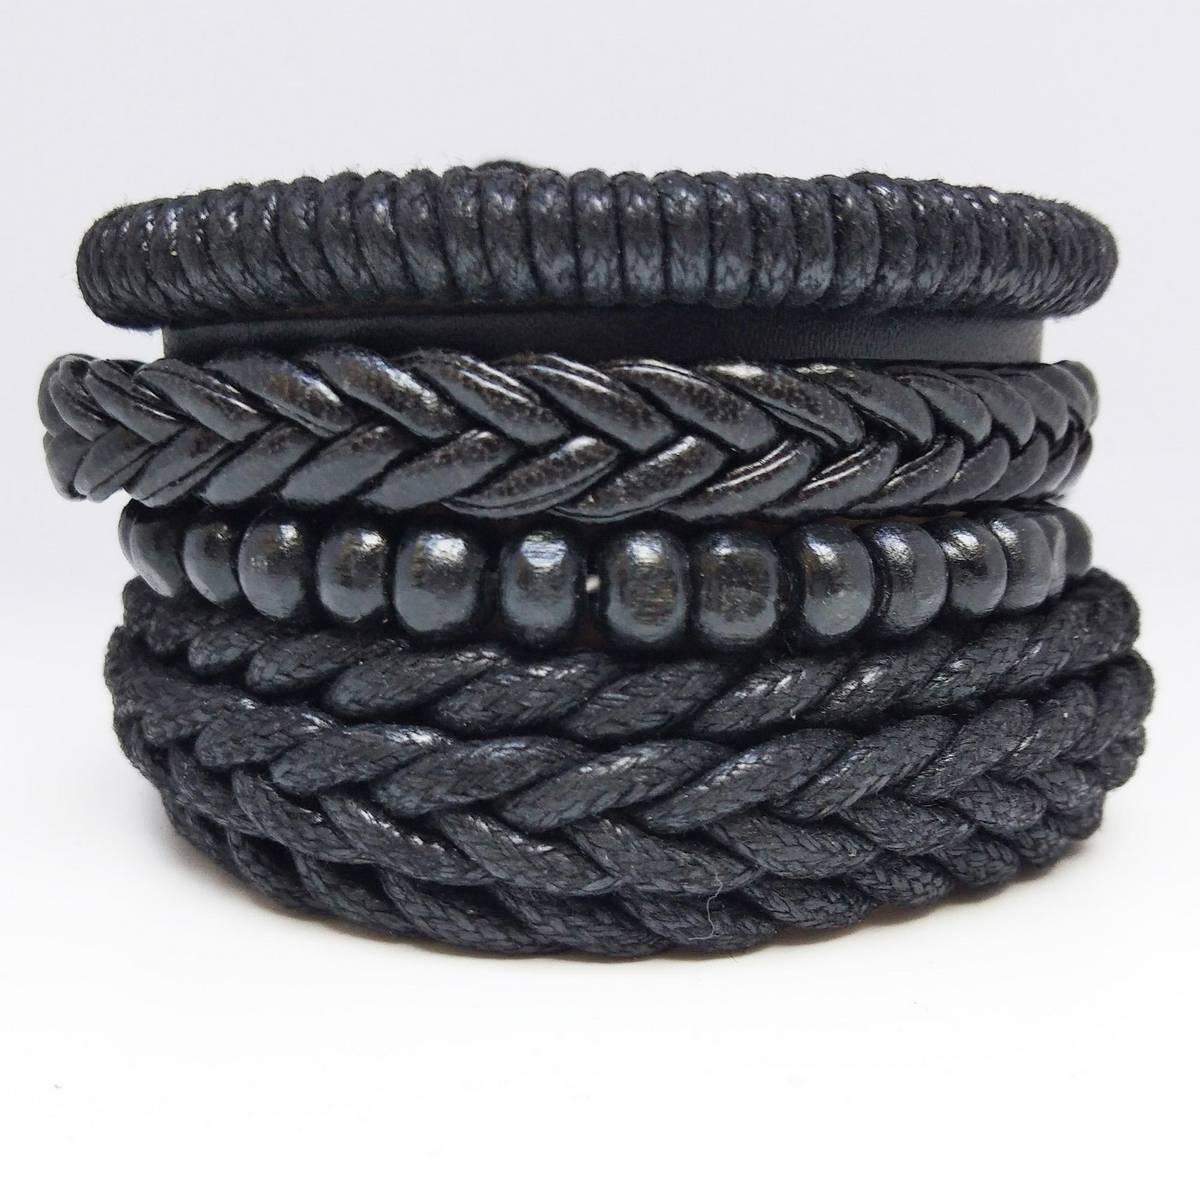 Stylish 4 Pcs Multilayer Handmade Leather Bracelet Charms Beads for Men Unisex Punk Wrist Hand Bands